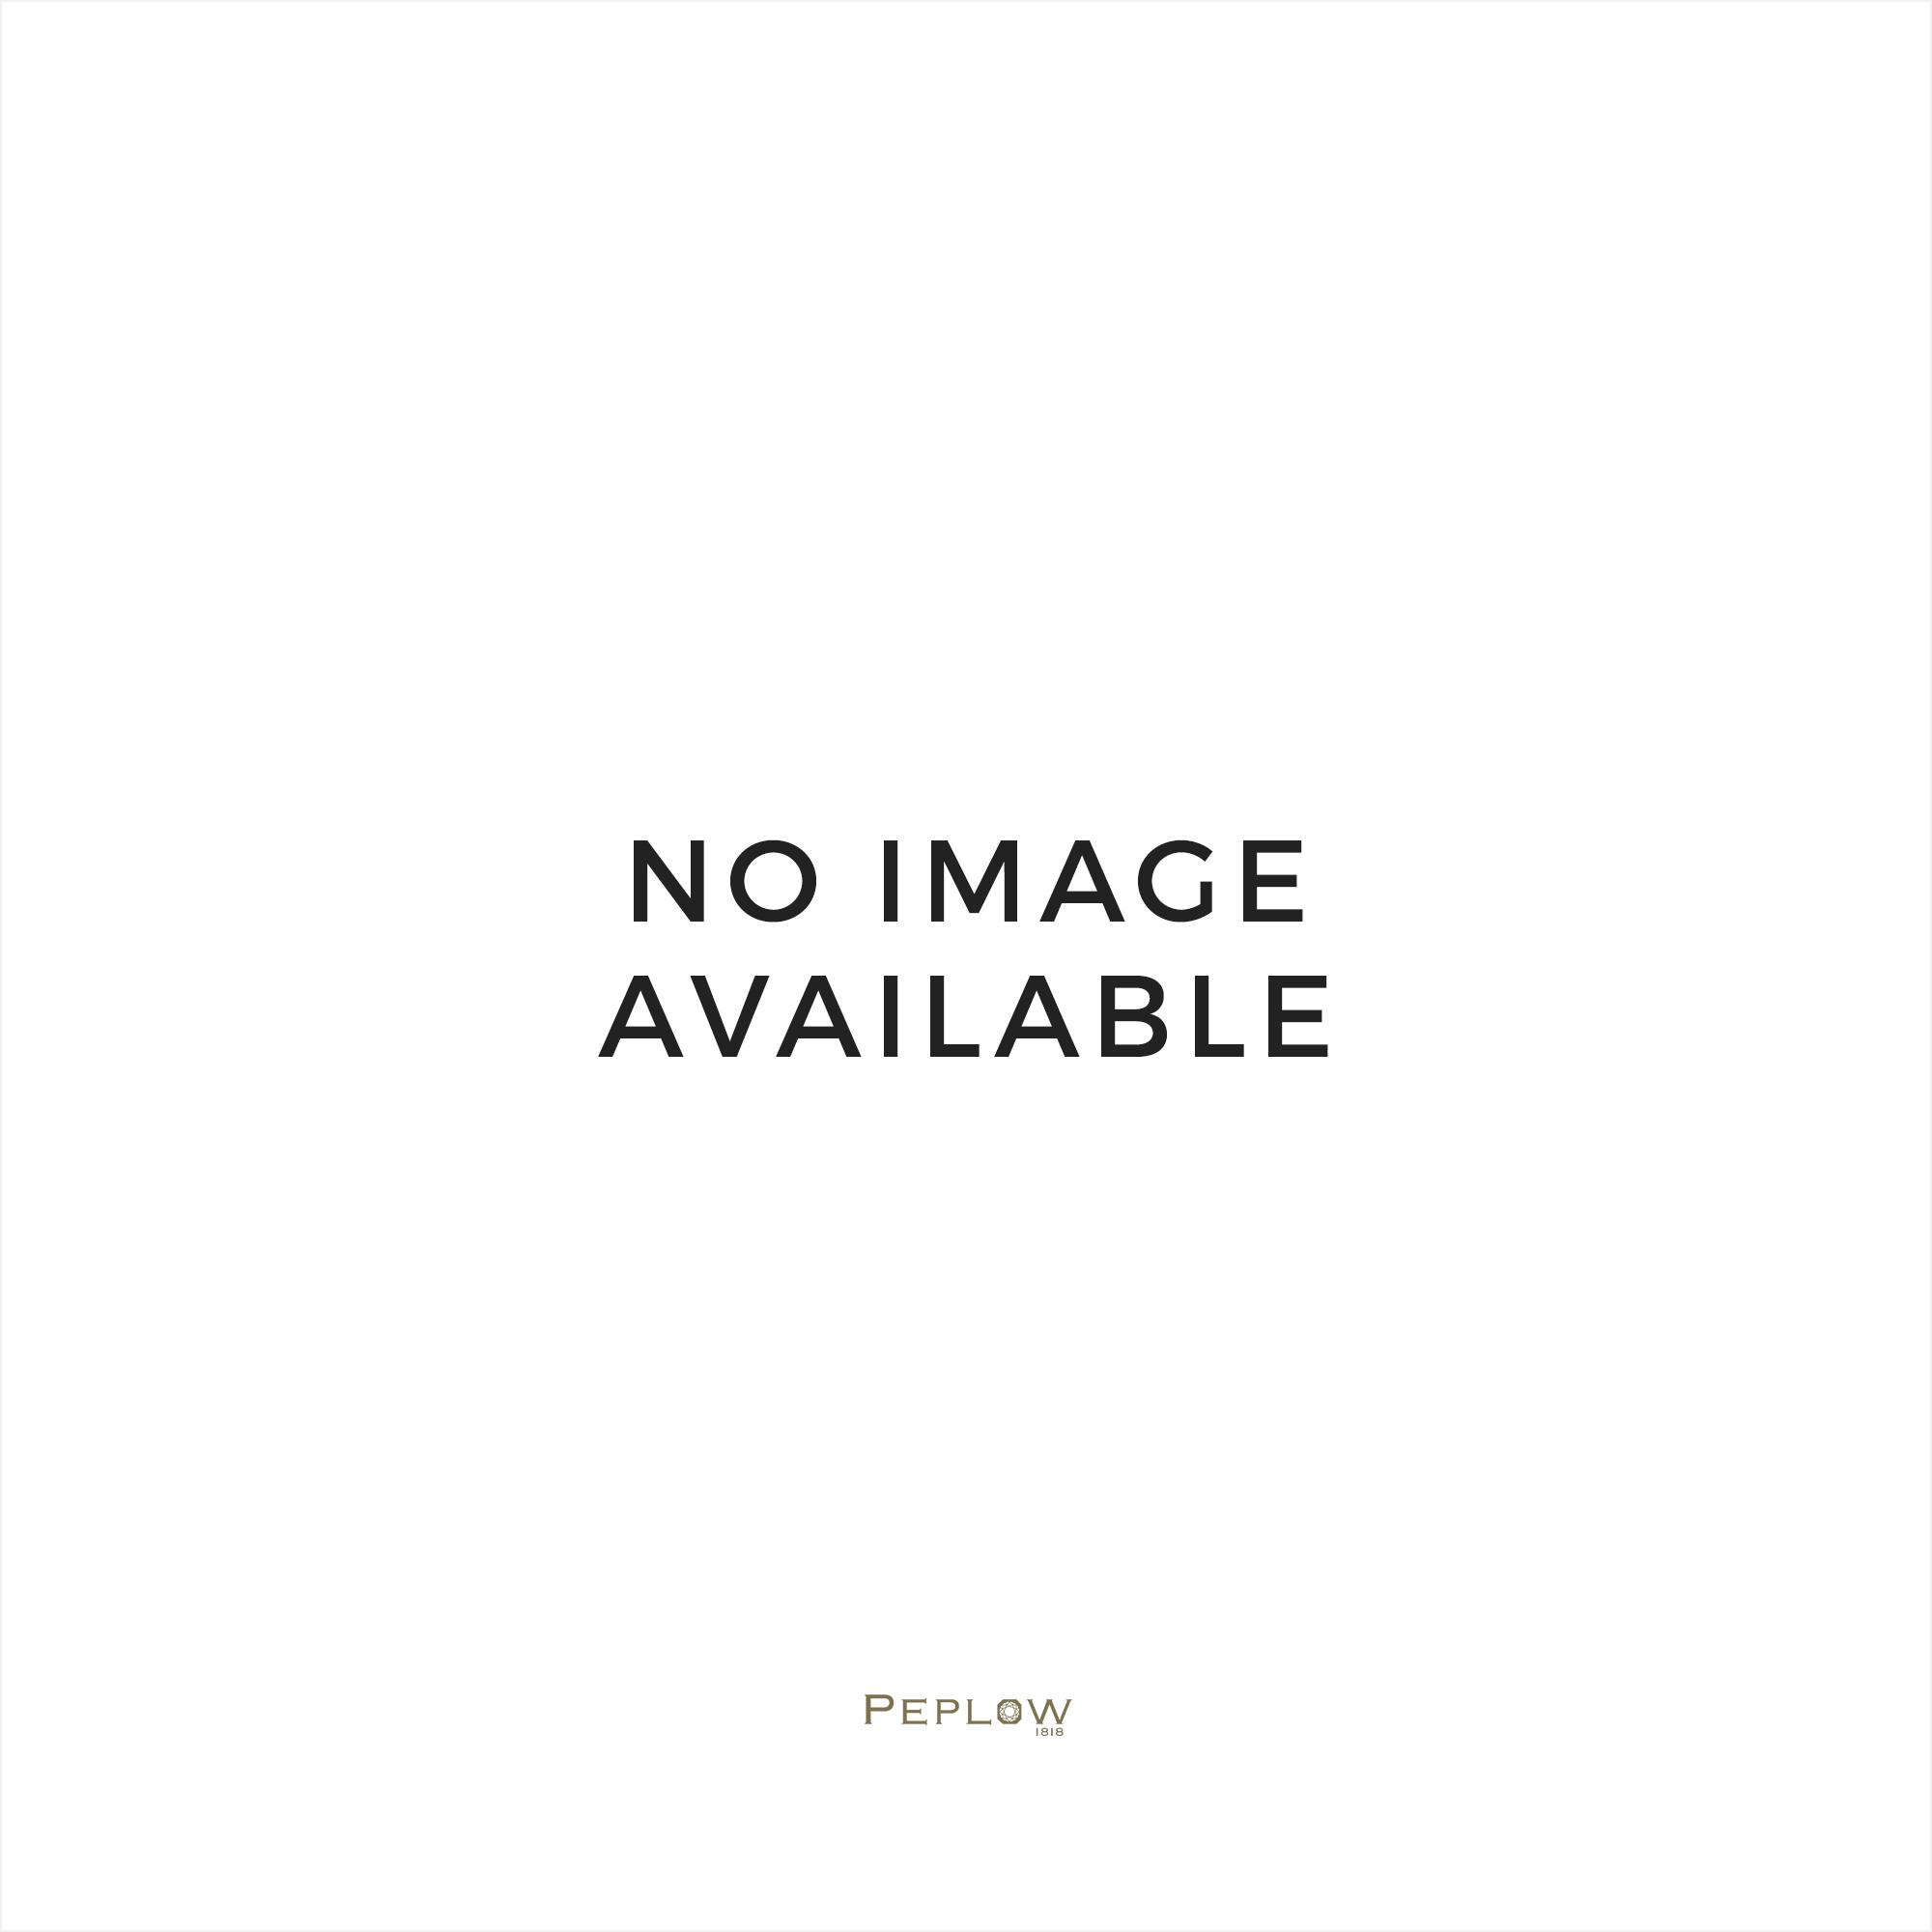 Citizen Watches Citizen Ladies Eco-Drive Gold Plated Silhouette Diamond Watch EW1922-58D